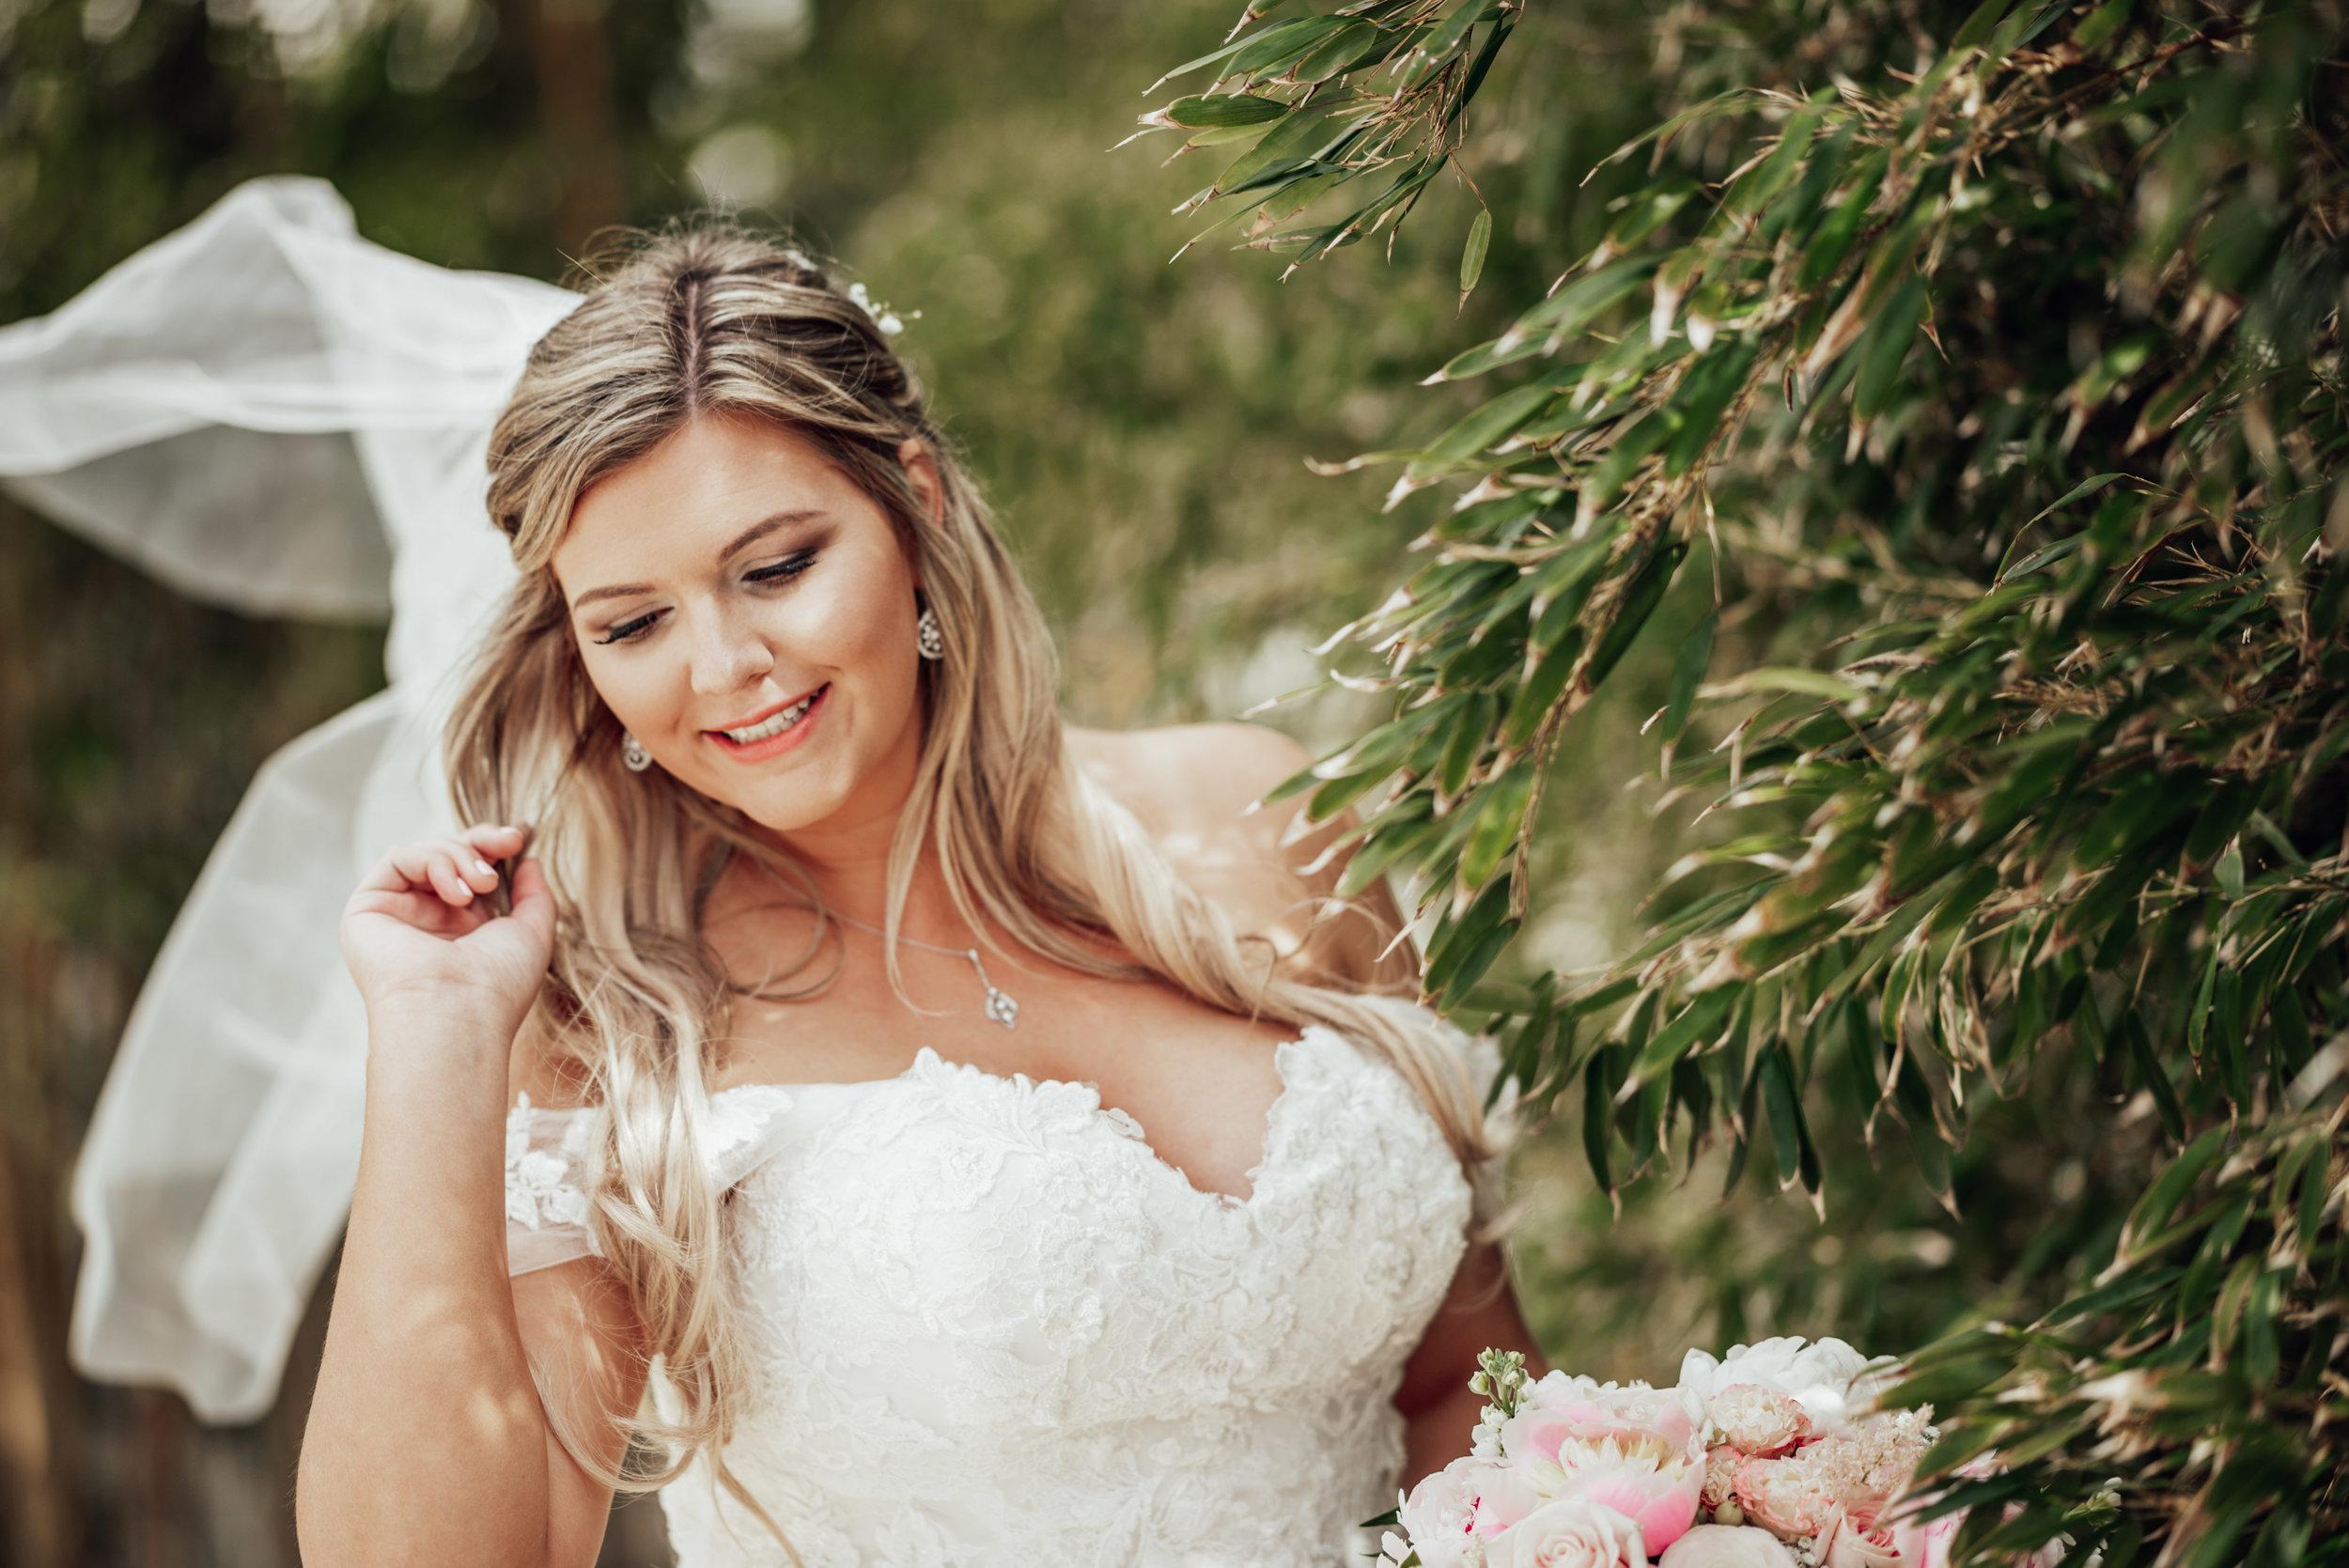 New Jersey Wedding Photographer, Felsberg Photography LBI wedding photography 57.jpg